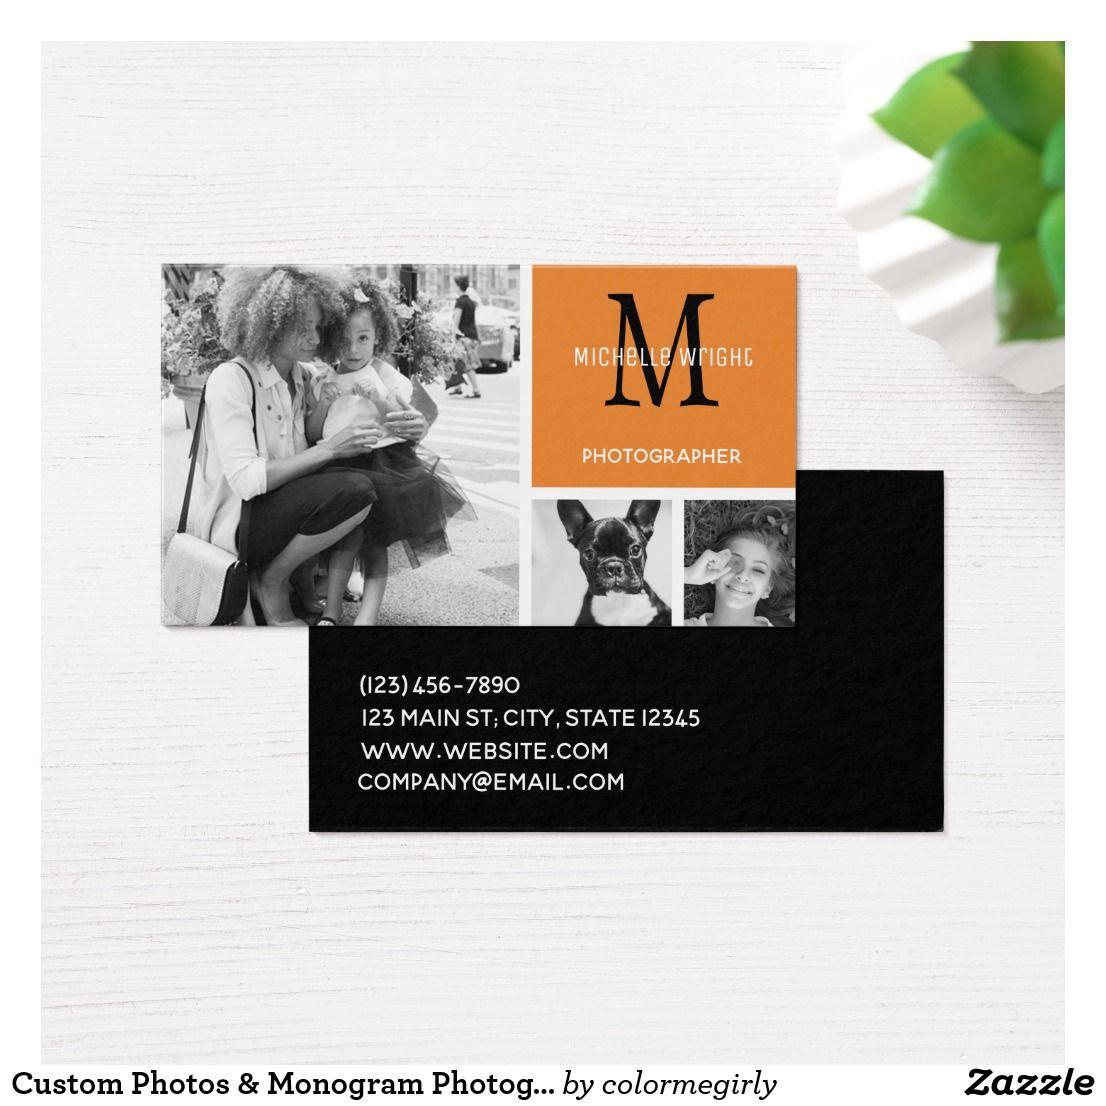 Custom Photos & Monogram Photographer Business Card | Photographer ...